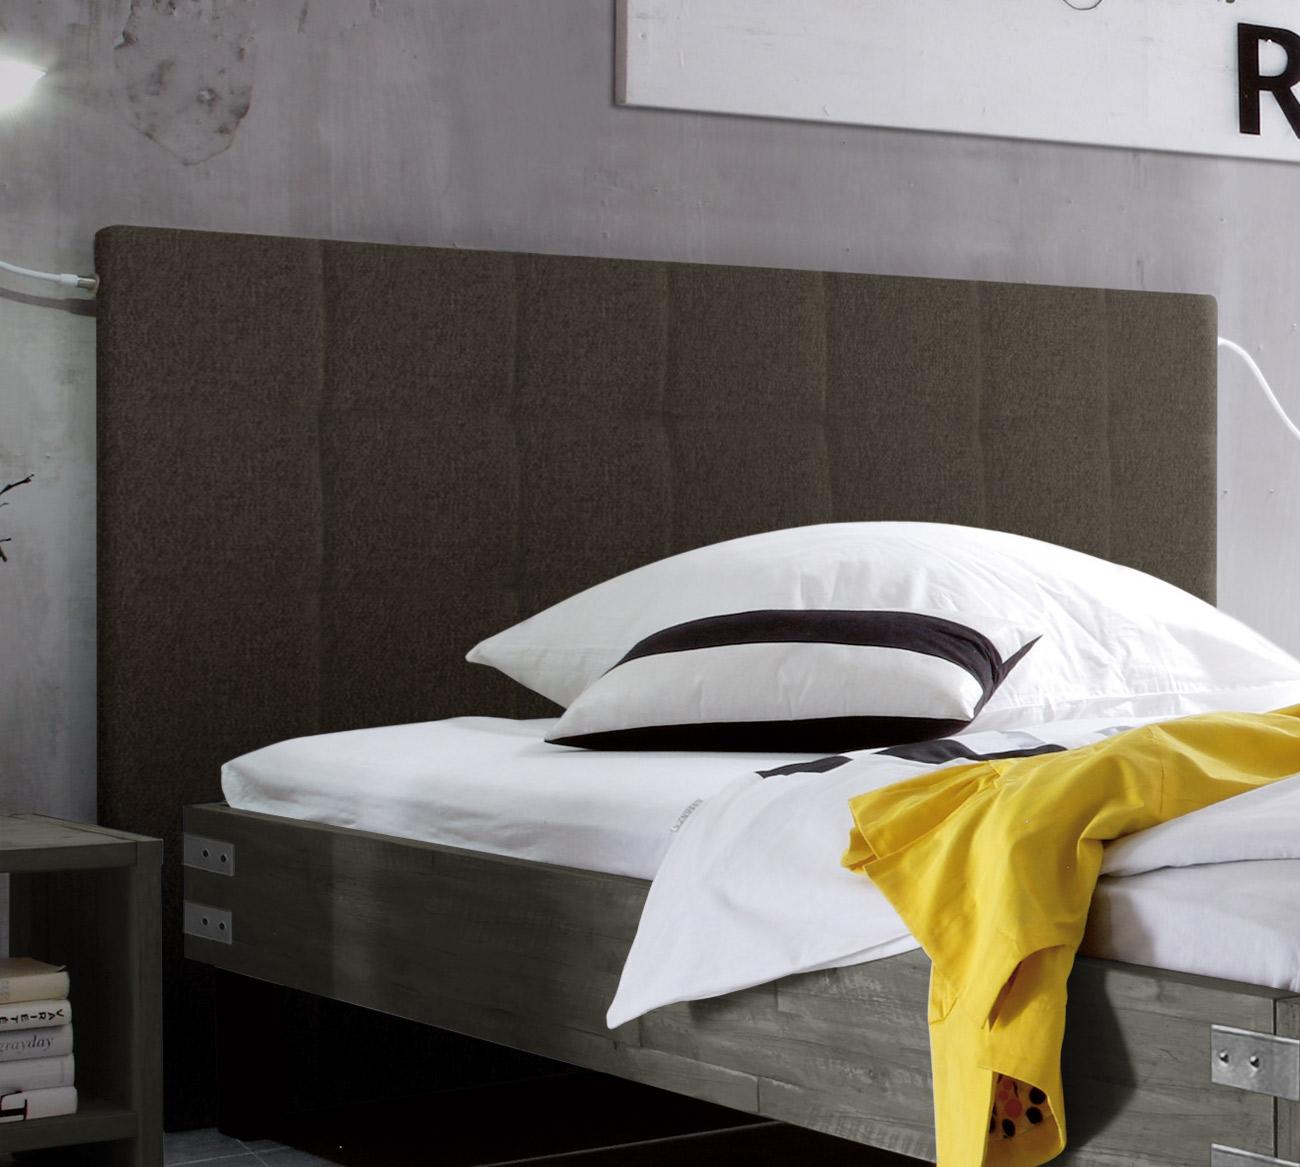 Vintage-Bett in 180x200 cm mit hohem Kopfteil - Talca